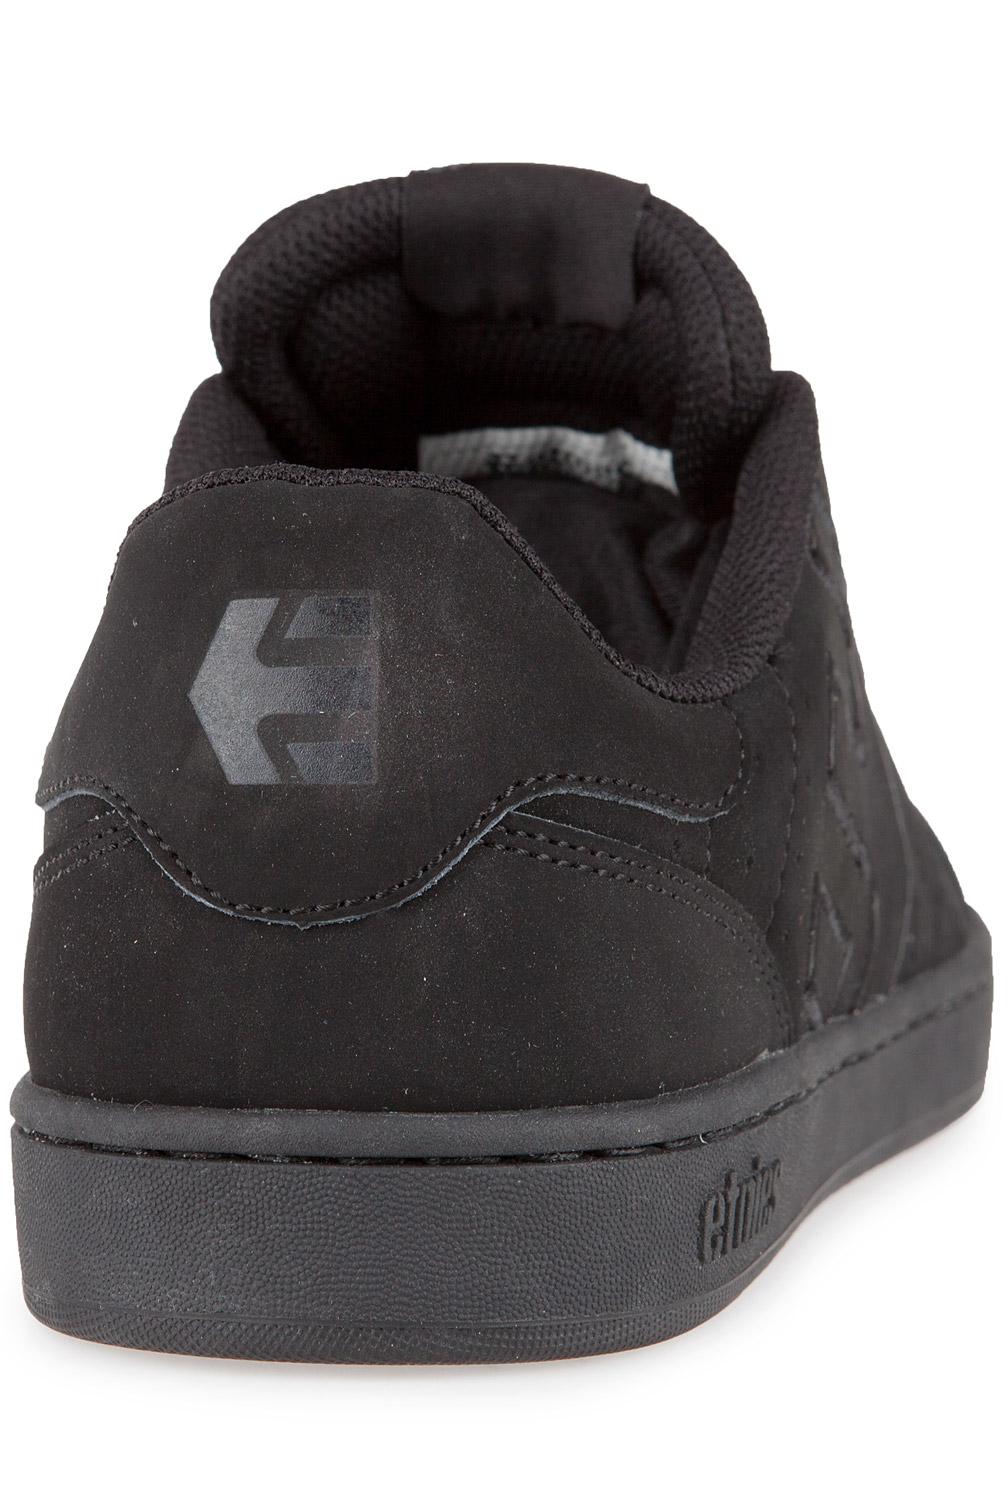 Uomo Etnies Fader LS black black black   Sneakers low top